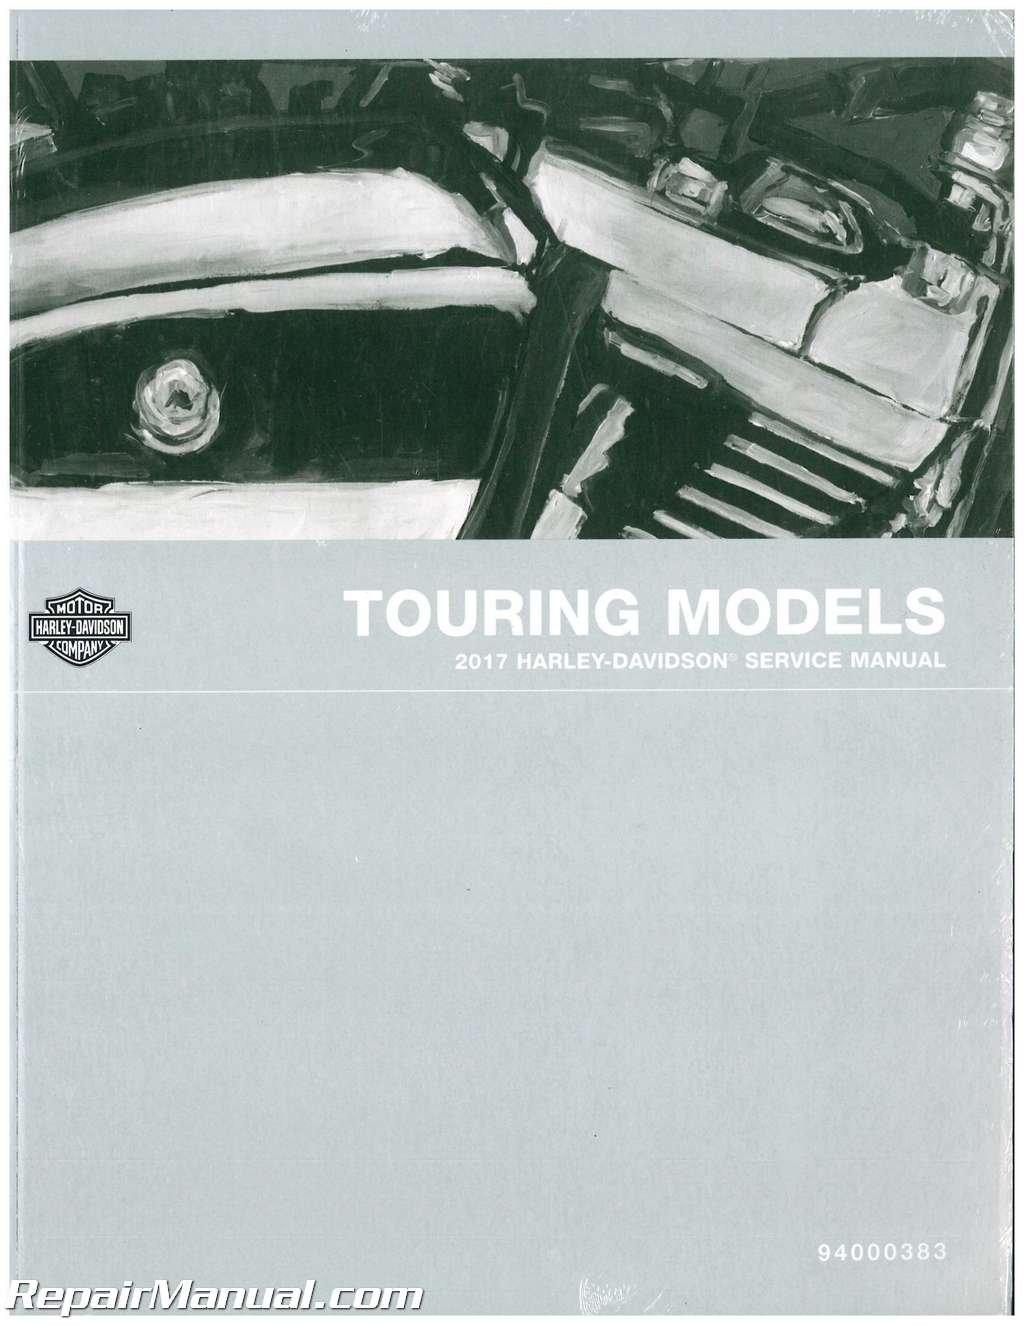 94000383 2017 Harley Davidson Touring Motorcycle Service Manual:  Manufacturer: Amazon.com: Books